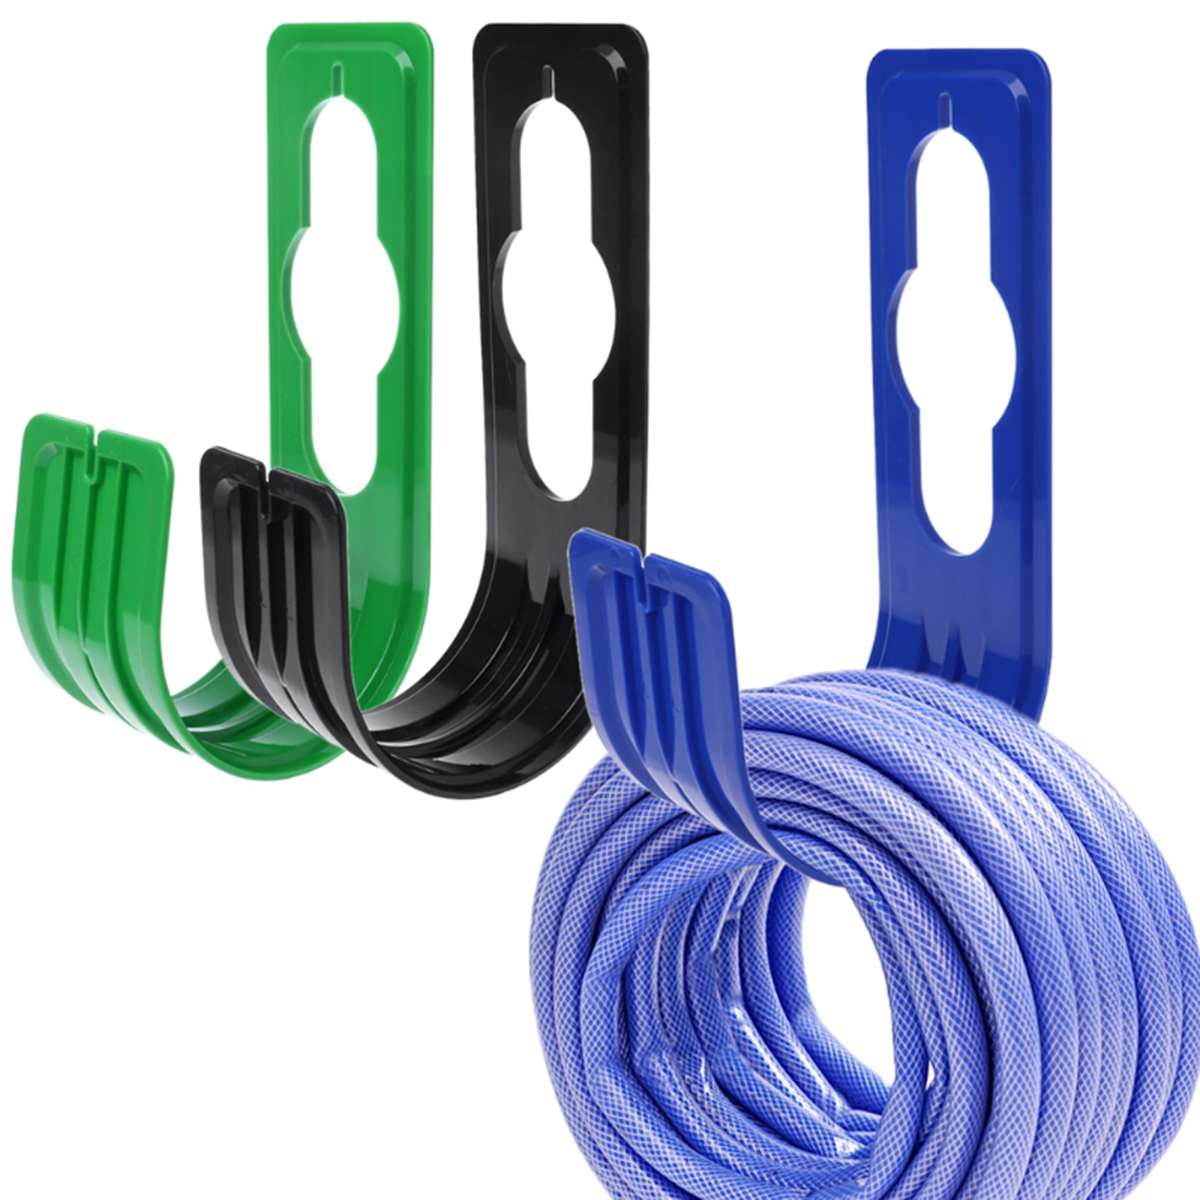 Garden Yard Watering Organizer Hook Storage Rack Pipe Holder Hosepipe Hanger